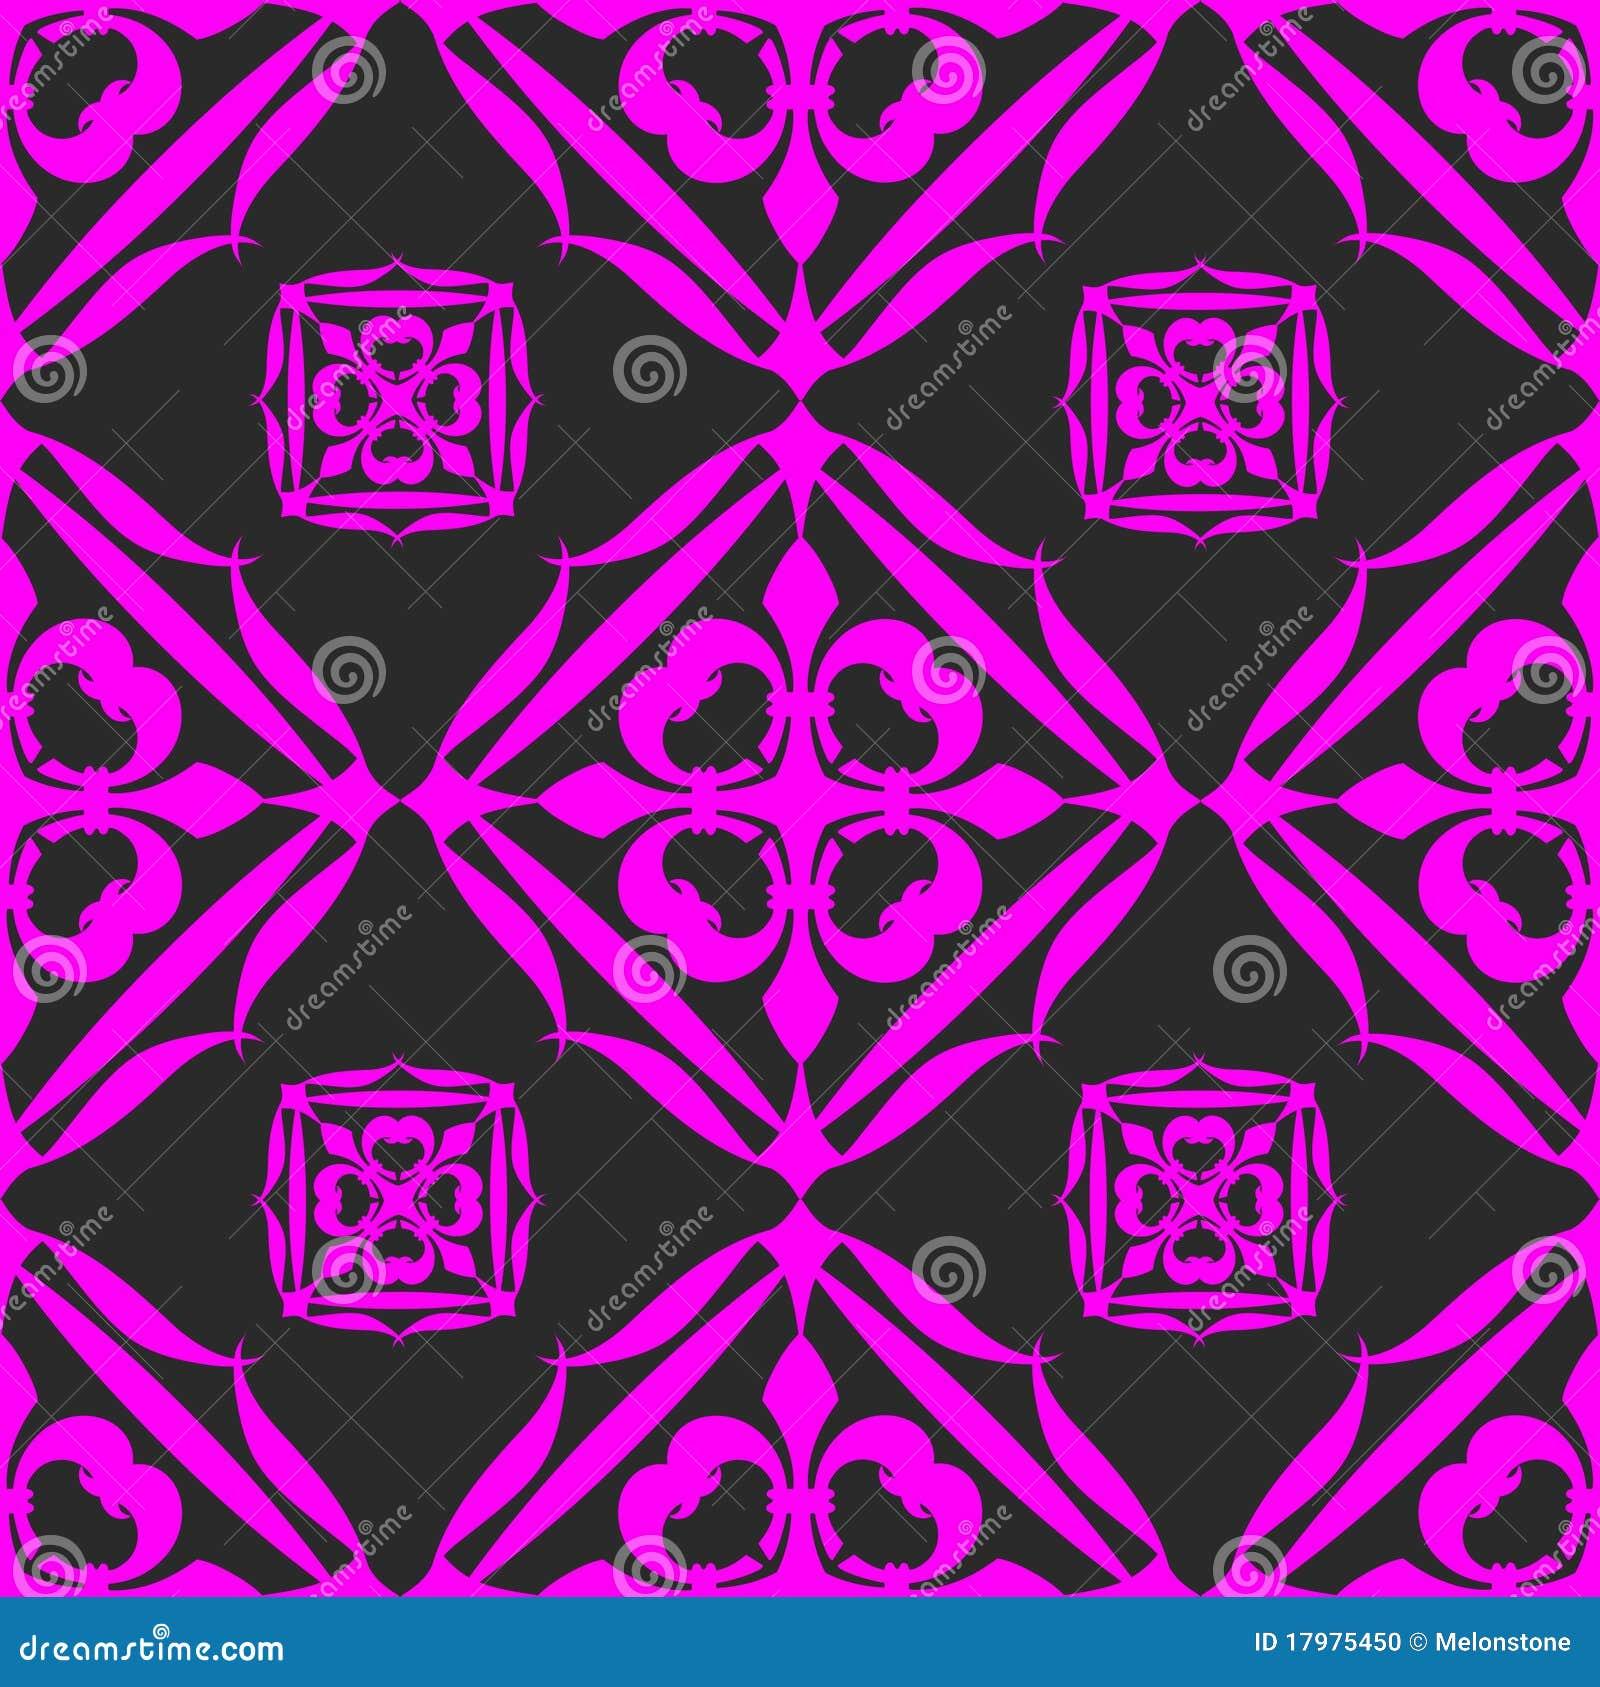 Wallpaper Black Pink: Seamless Black Pink Wallpaper Stock Illustration